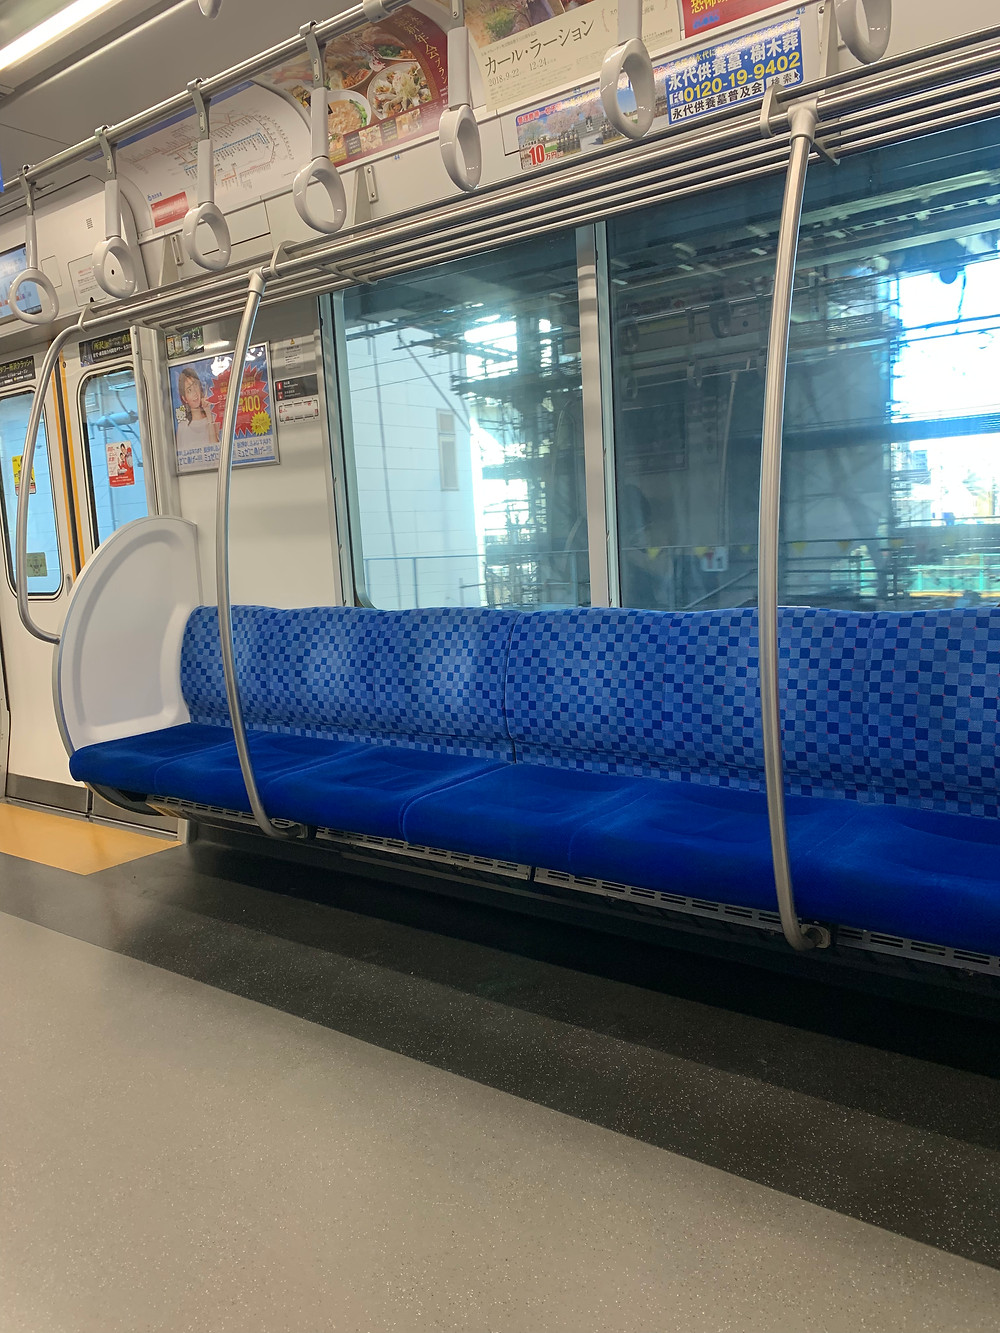 Seat of Seibu railway